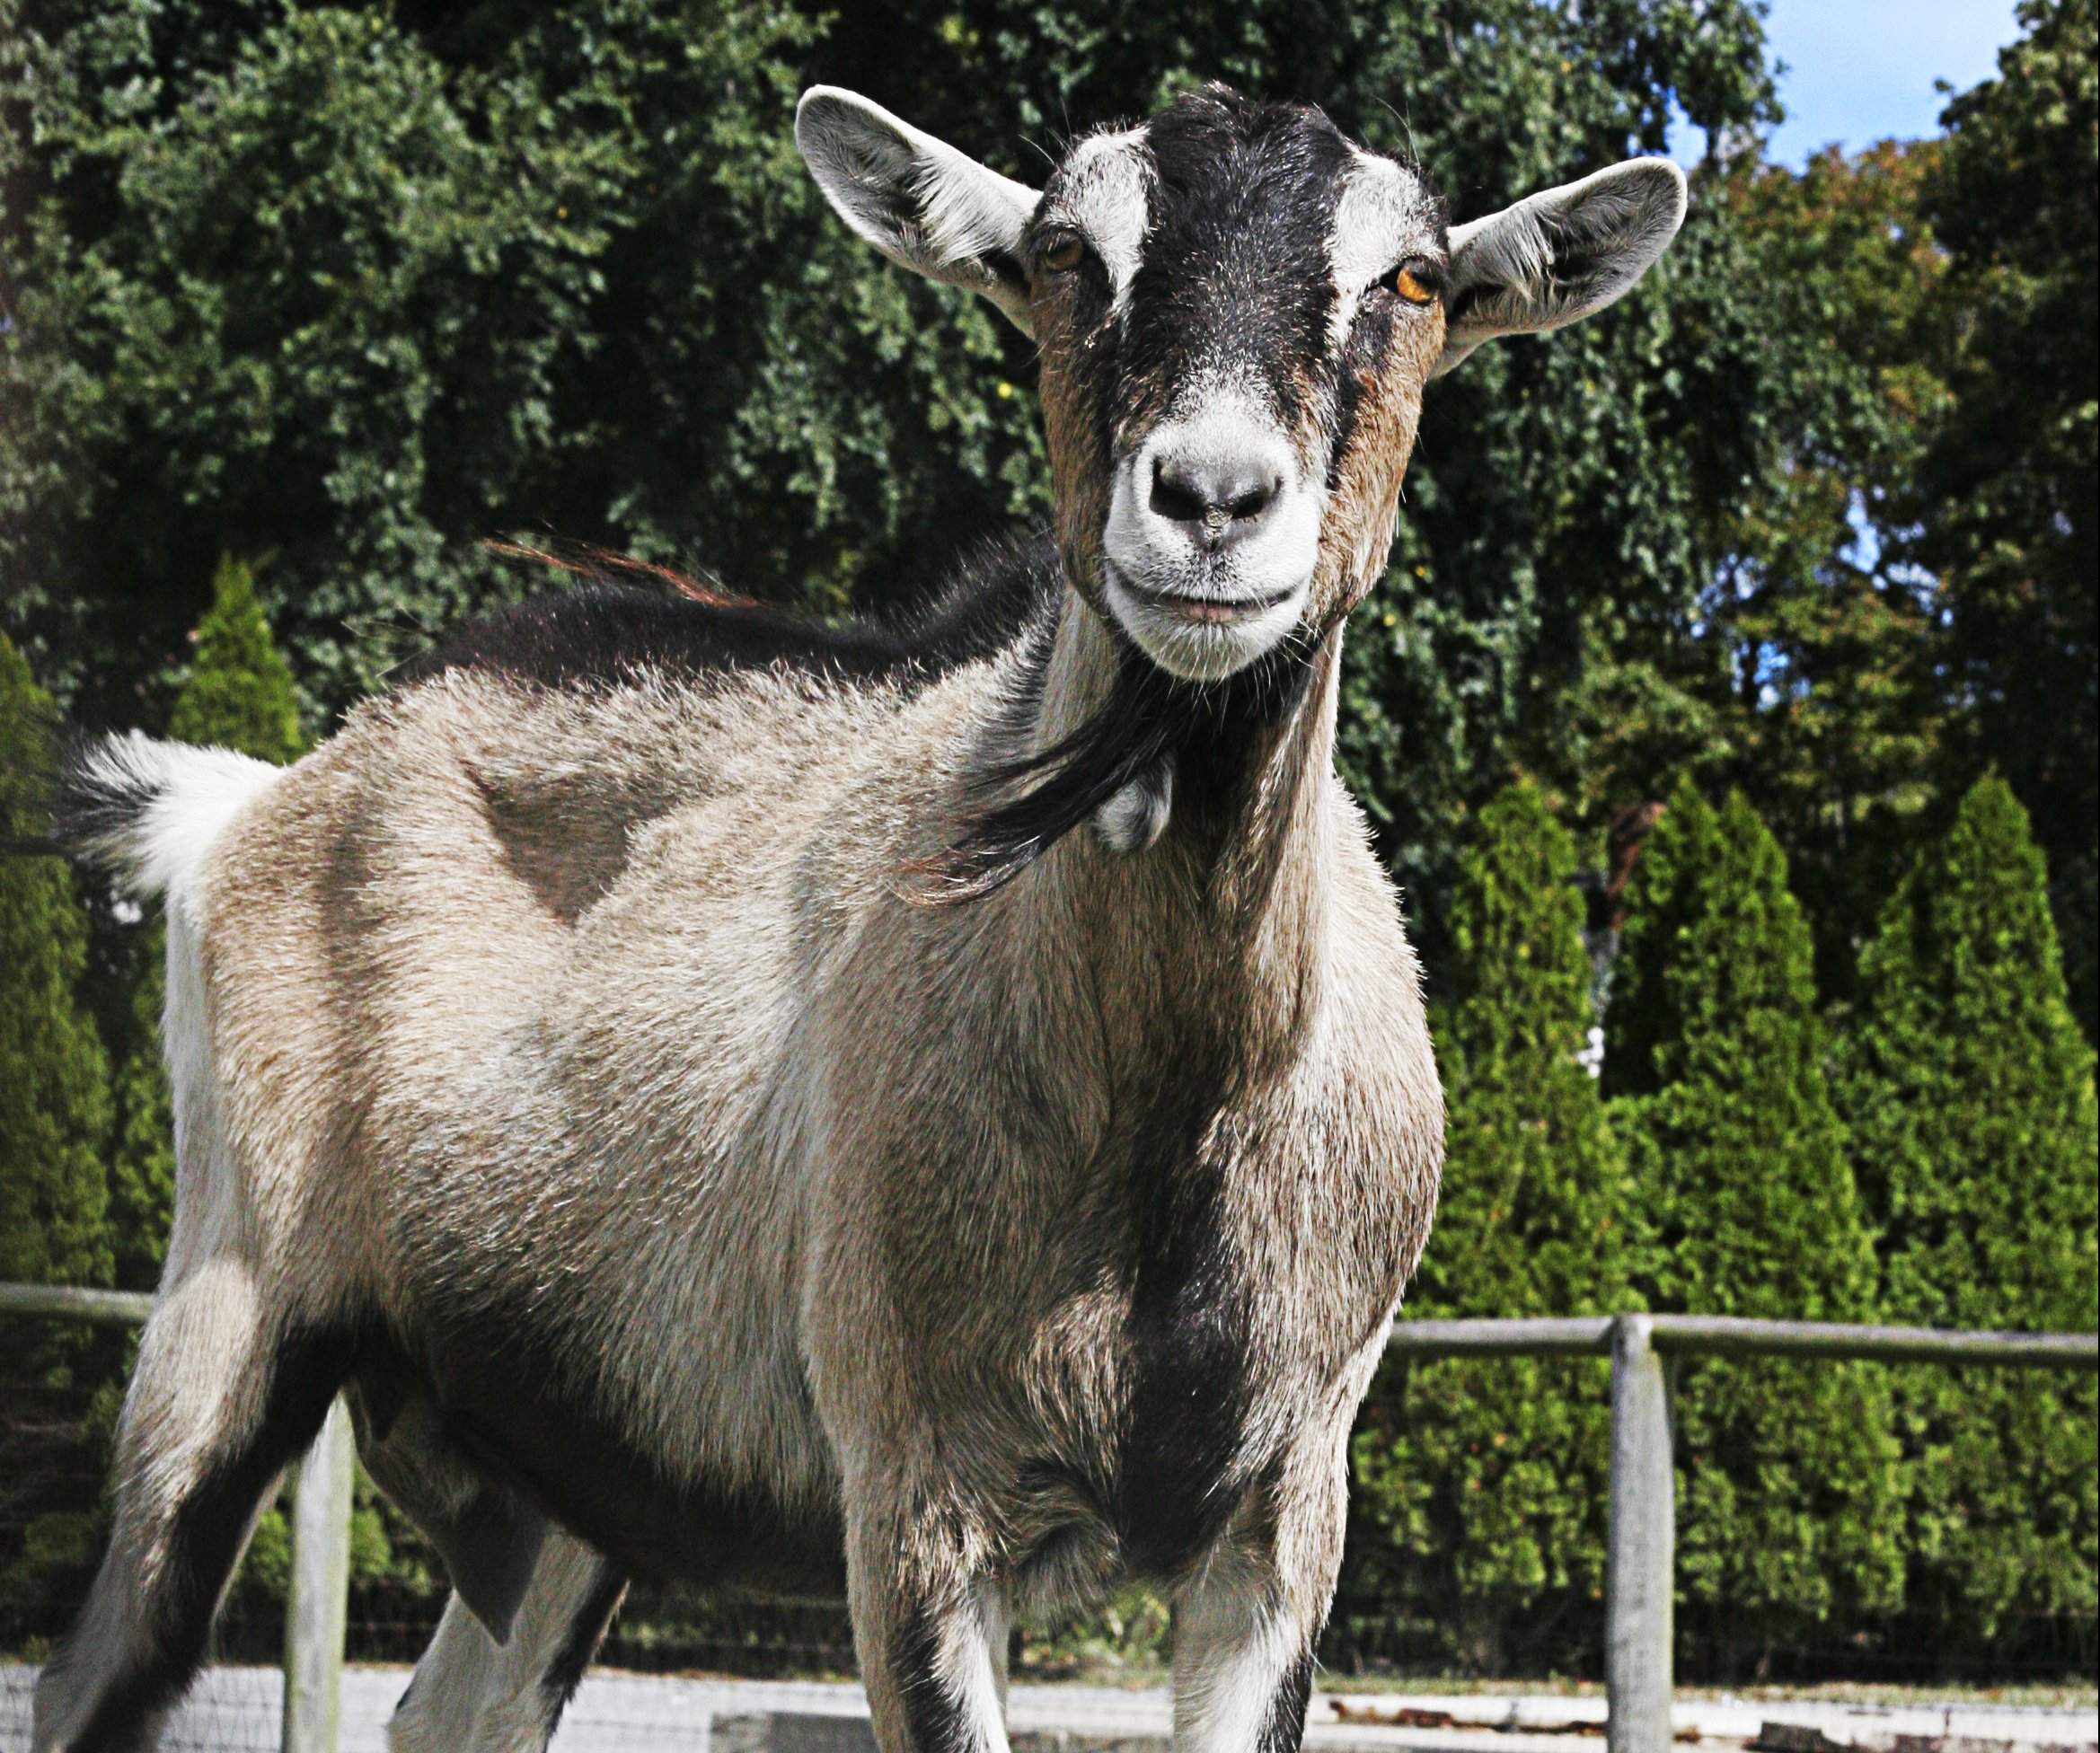 Victory Alert: Cruel Goat Races Cancelled!